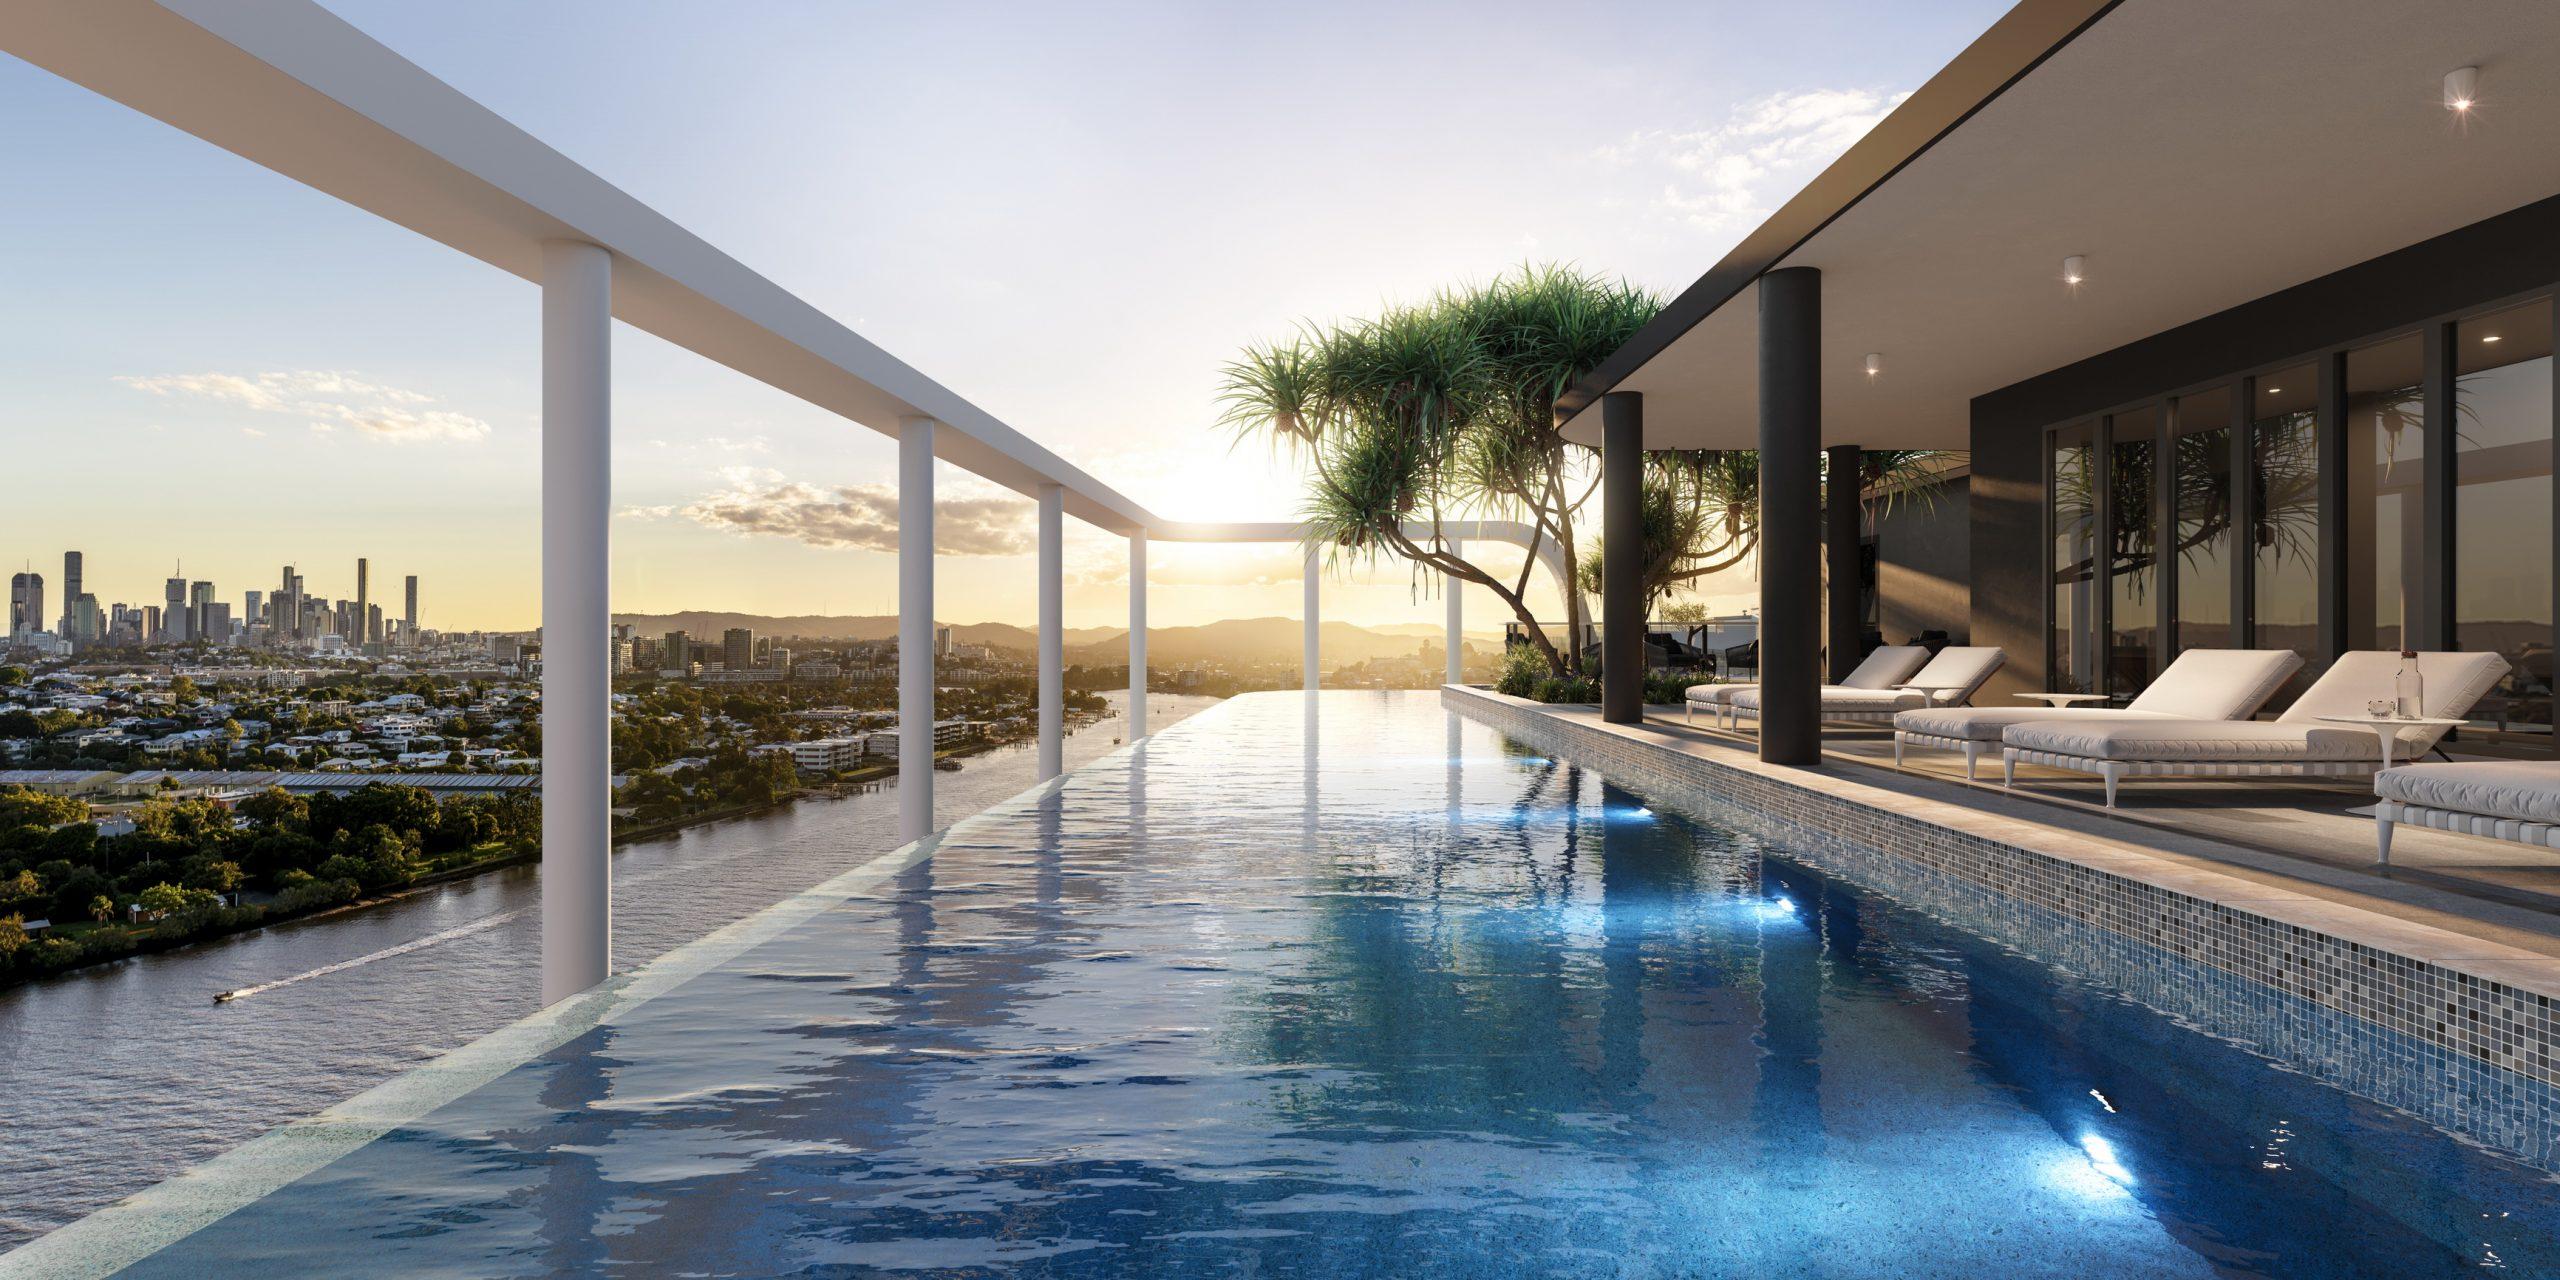 Rivello-queensland-render-3d-fkd-studio-architecture-luxury-exterior-pool-amenity